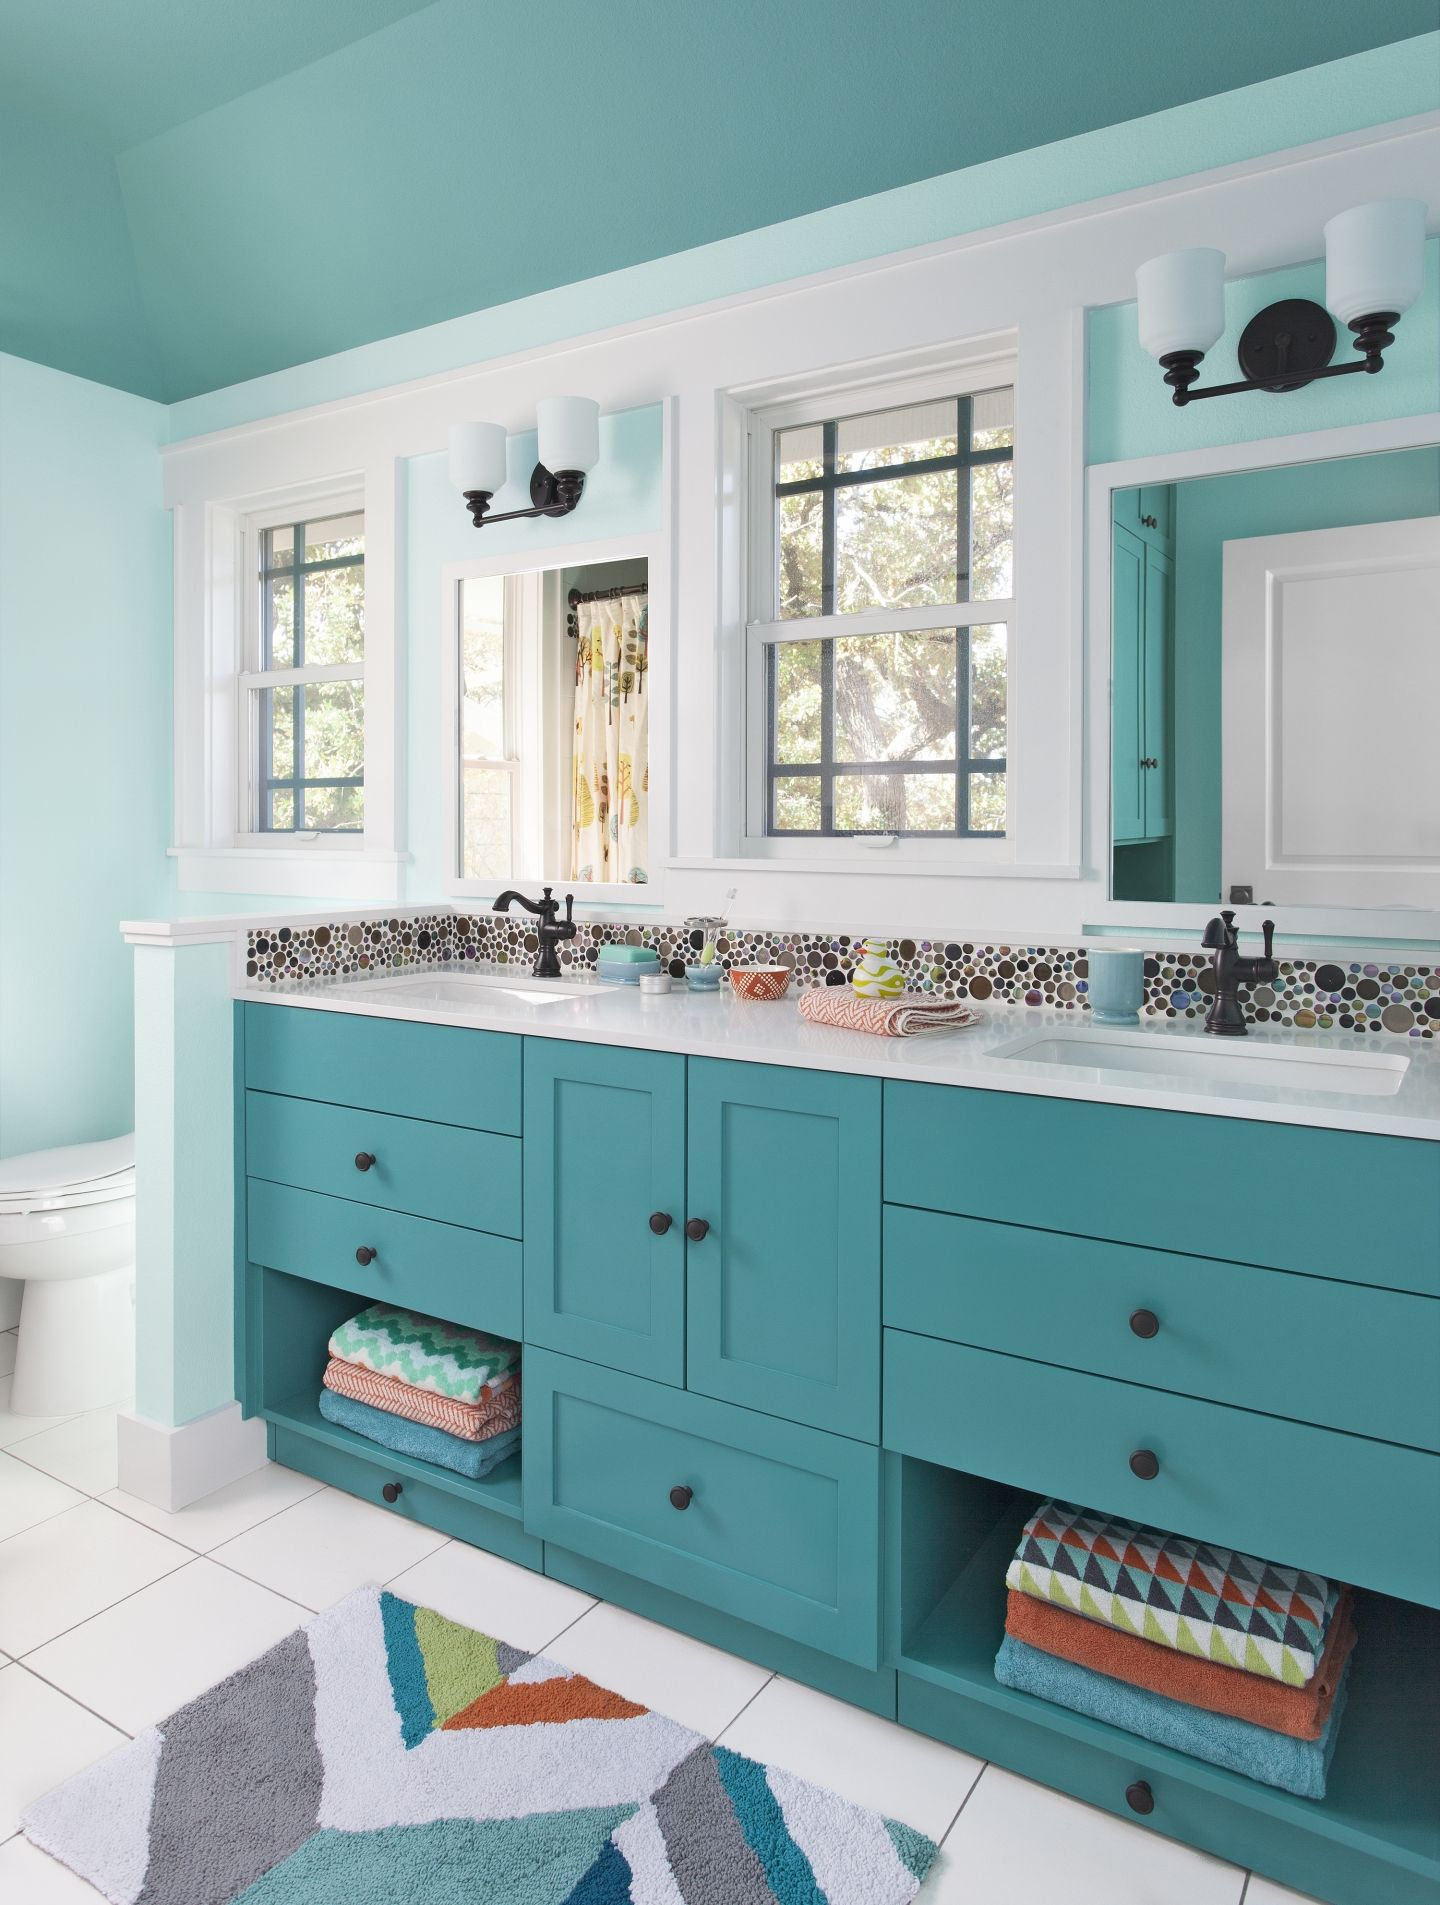 Simple Kitchen and Bath Updates to Improve Efficiency  Salles de